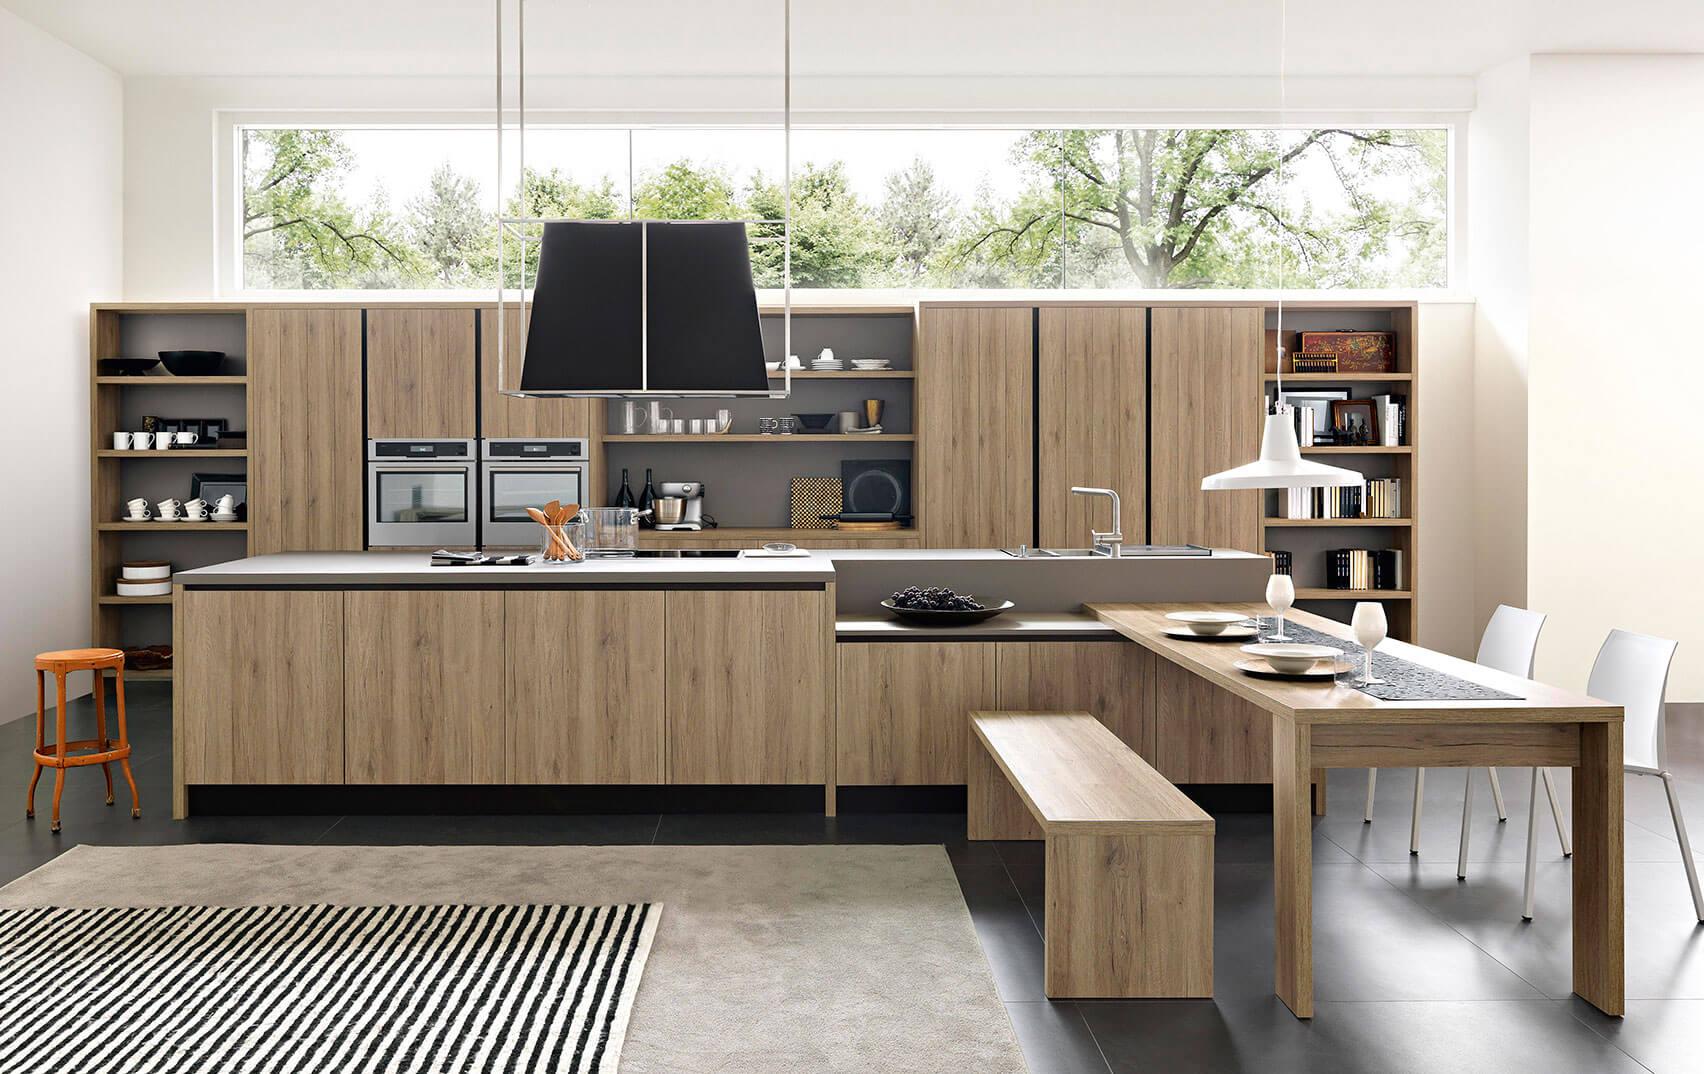 Decoracion de cocinas modernas en zaragoza blunni - Revestimientos para cocinas modernas ...